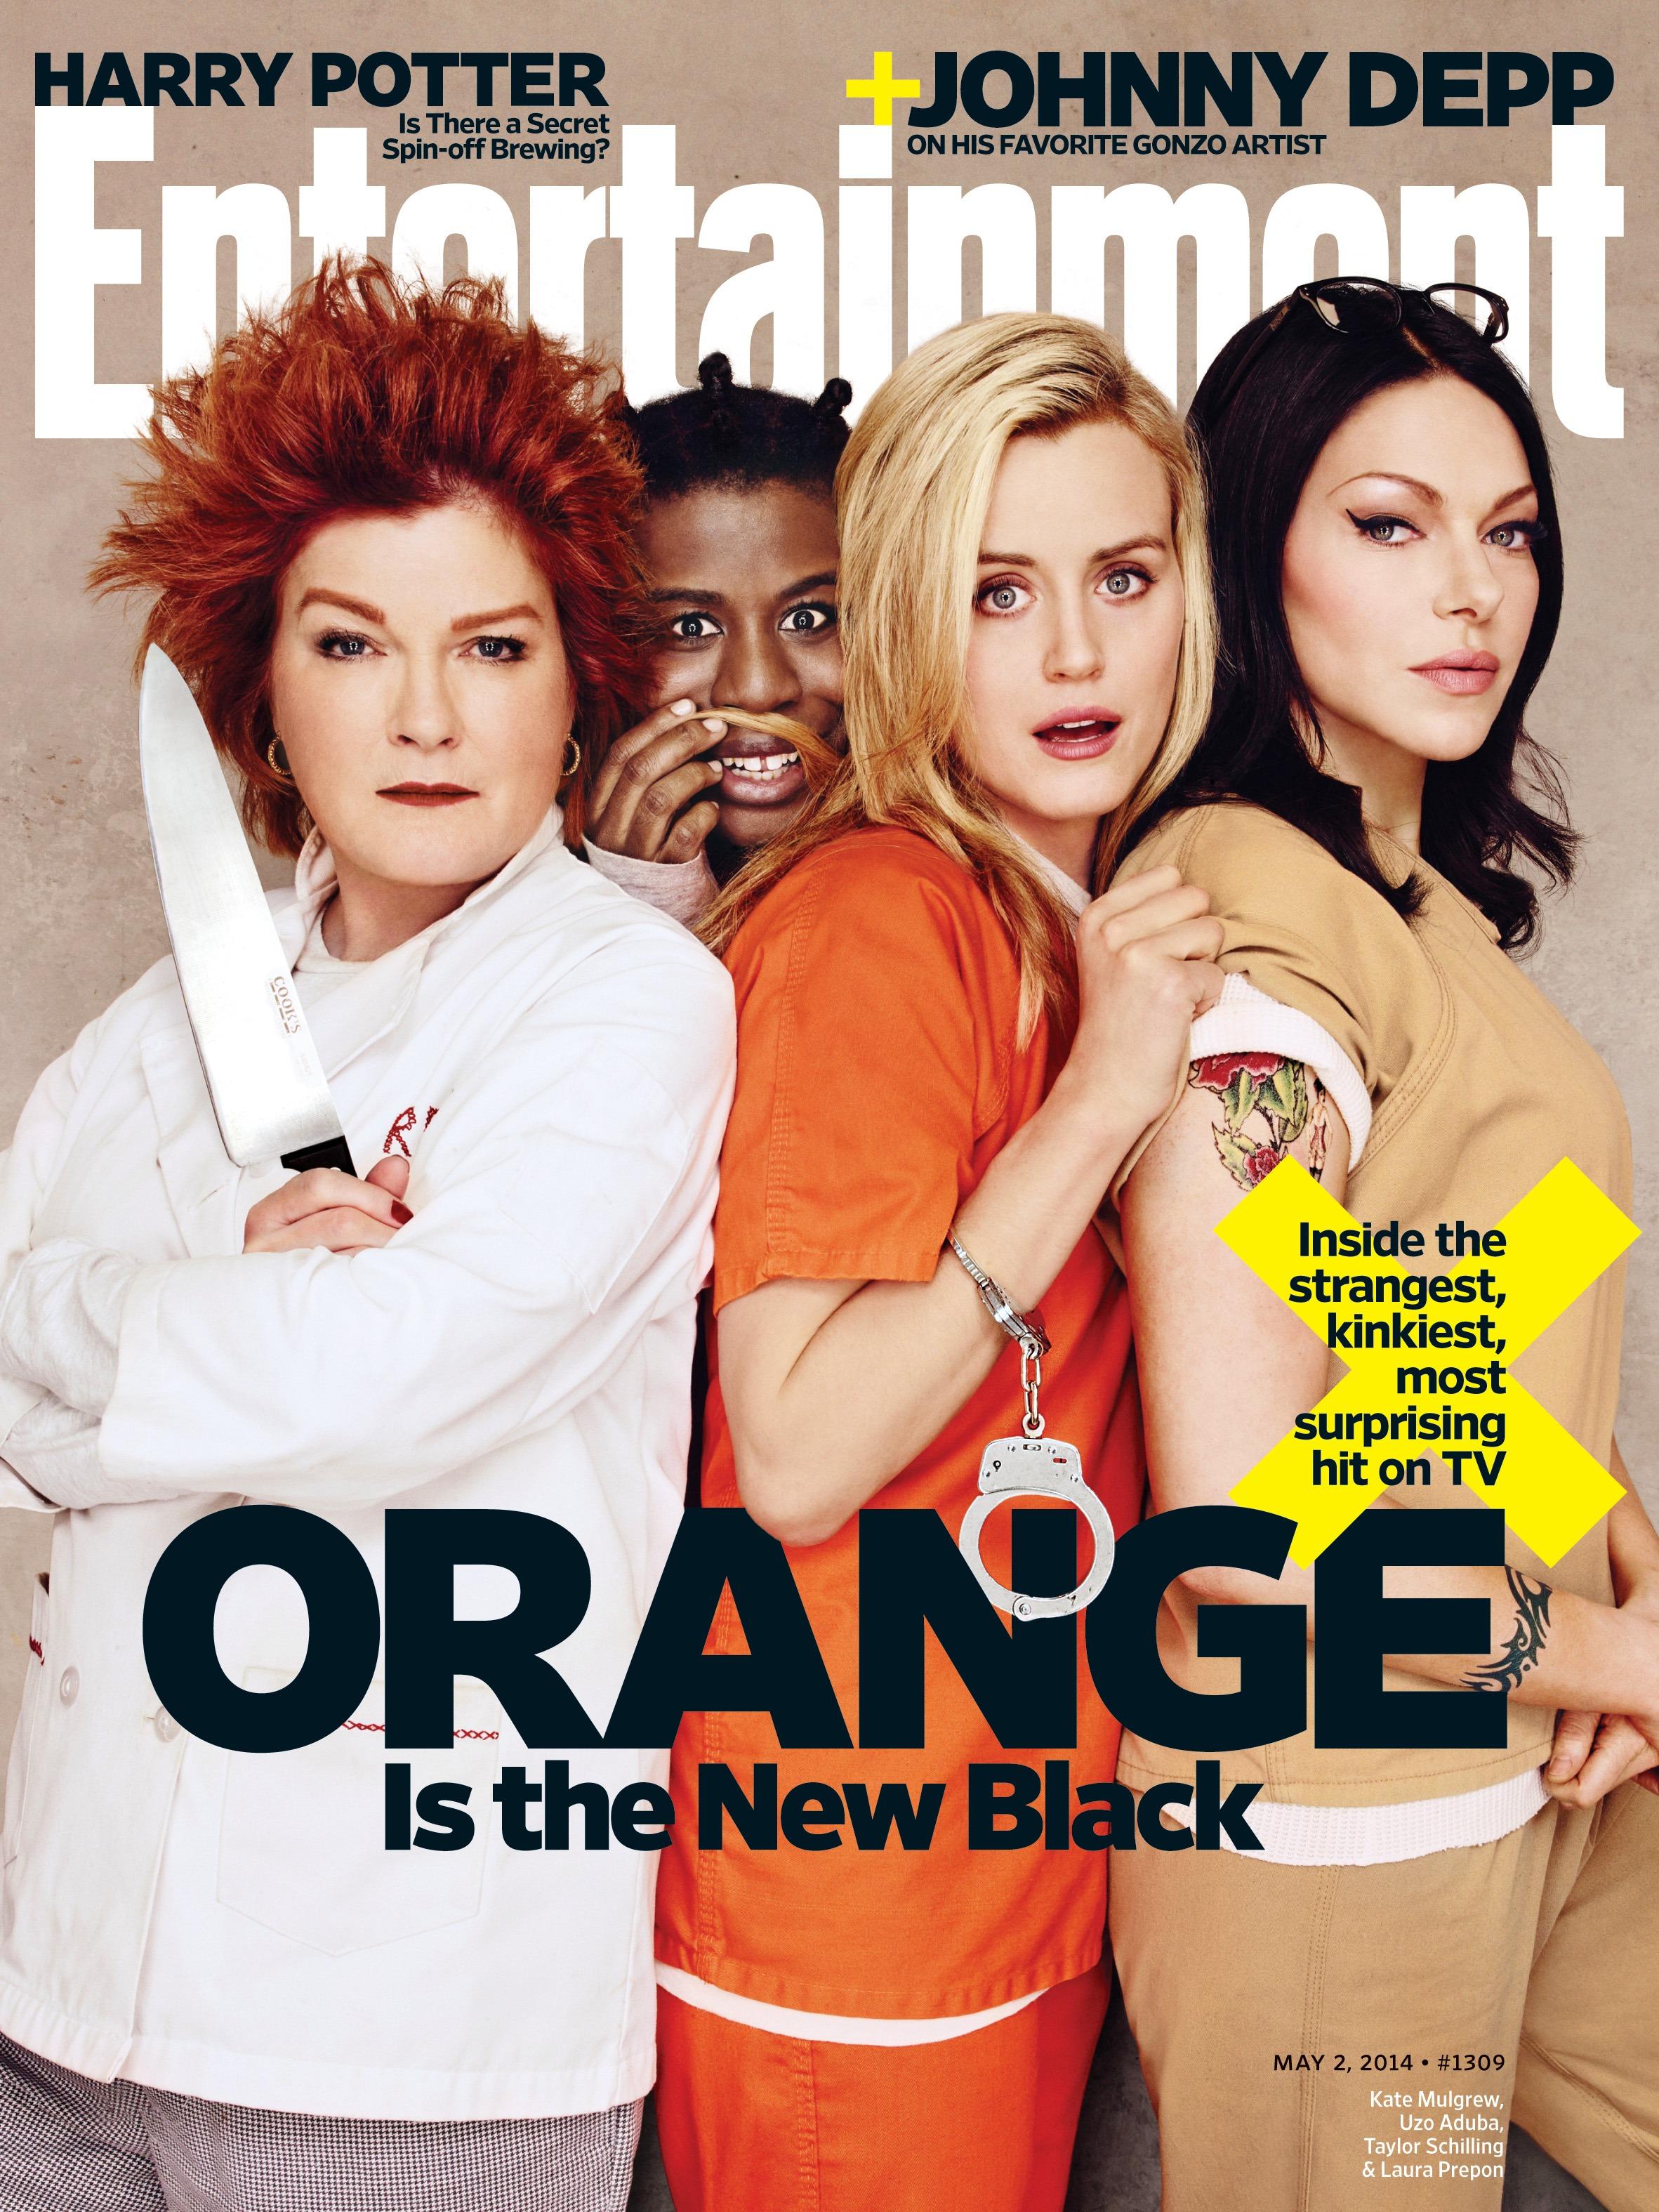 Kate Mulgrew, Uzo Aduba, Taylor Schilling, and Laura Prepon for Orange Is The New Black